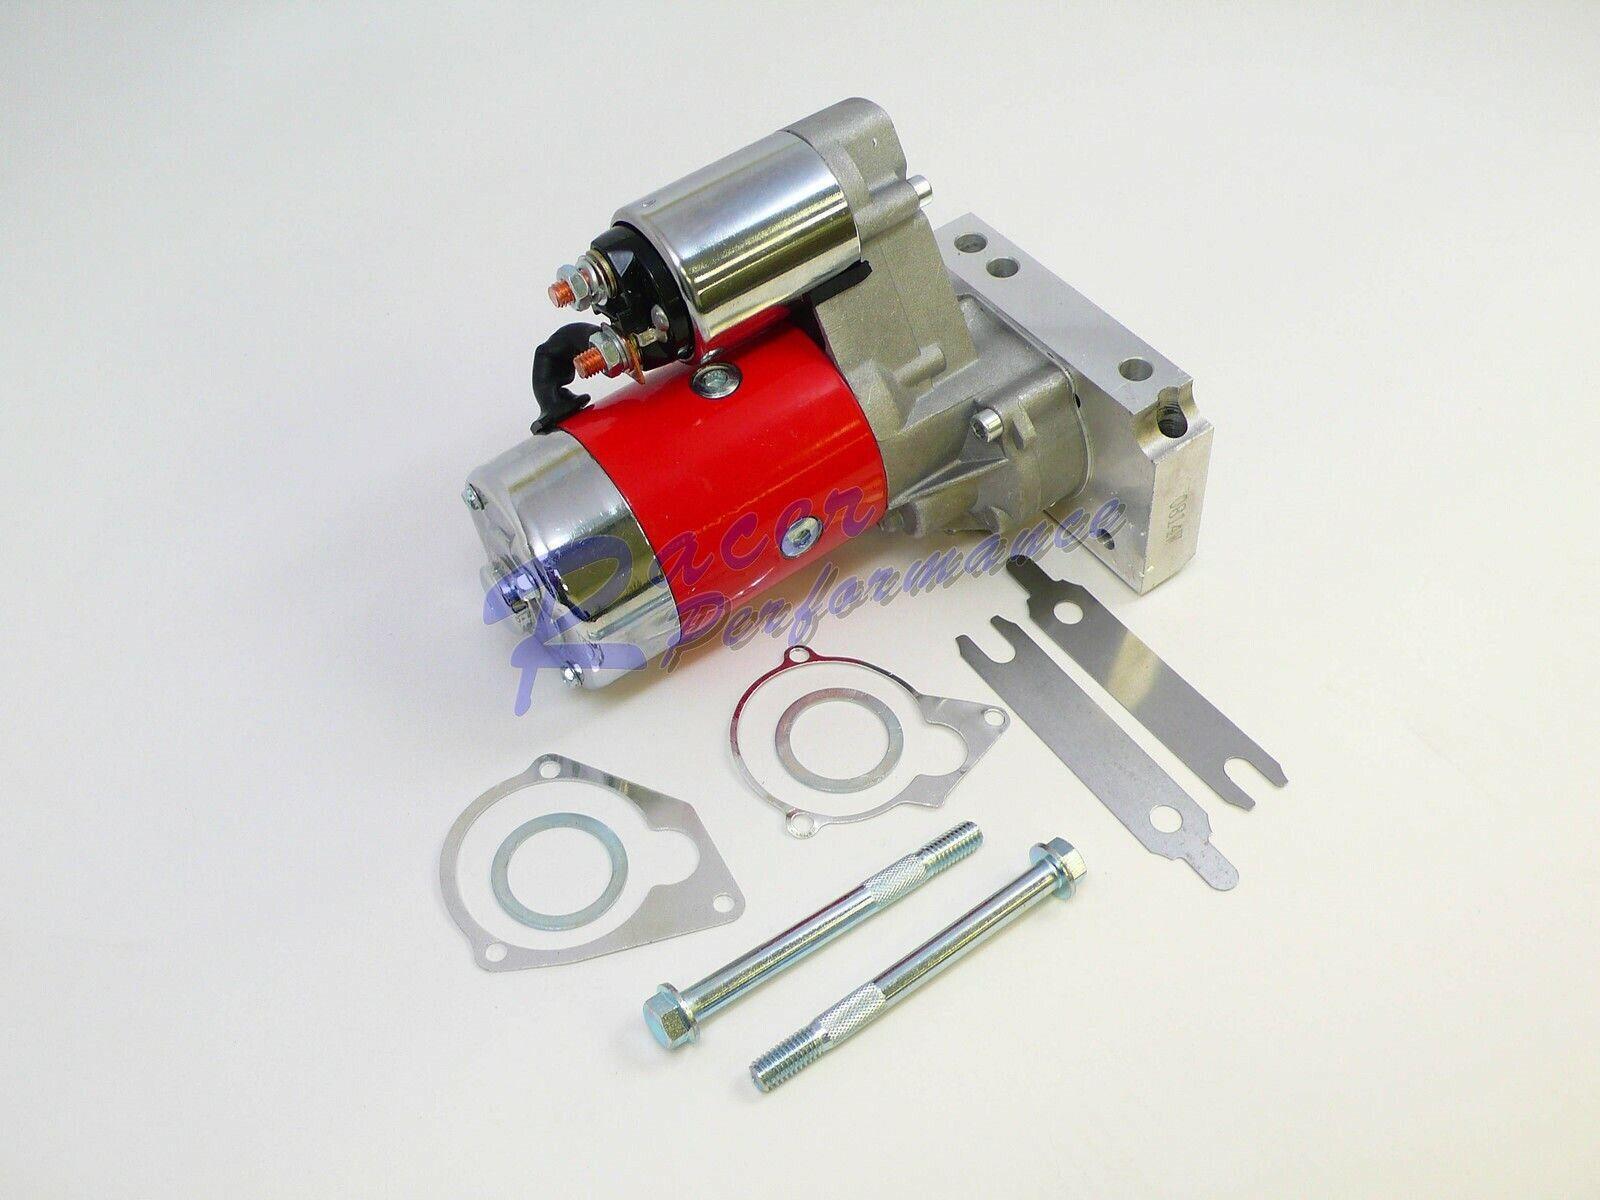 Sbc Bbc Chevy Mini Starter 3 Hp 3Hp Gear Reduction High Torque 153 168 Red